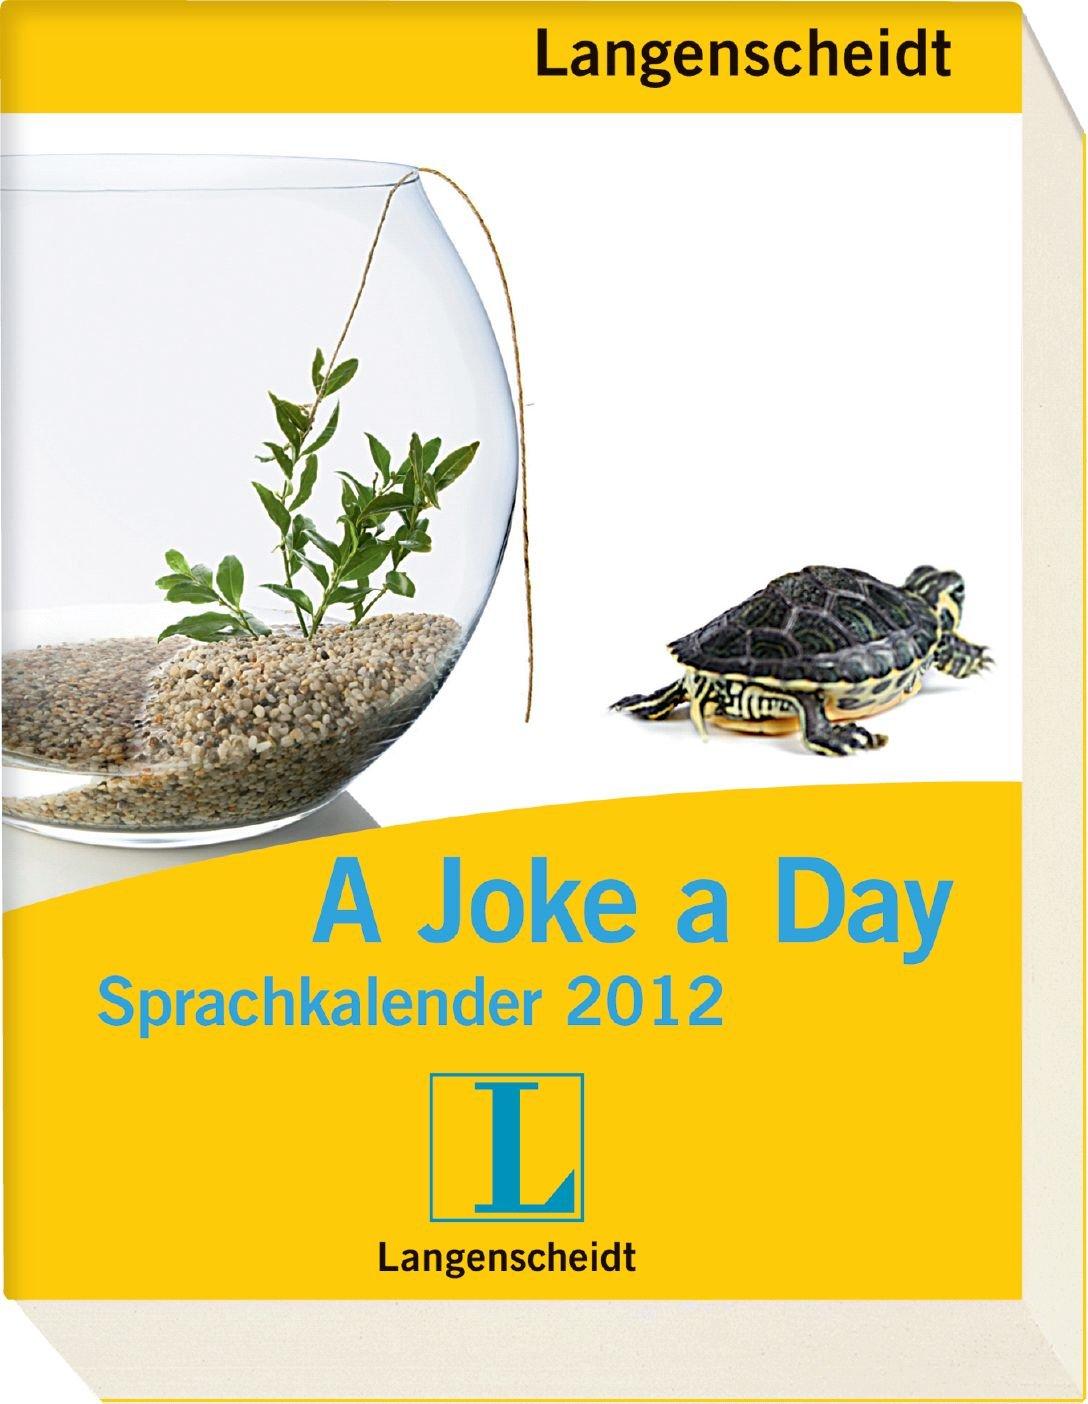 Langenscheidt Sprachkalender A Joke a day 2012 - Abreißkalender